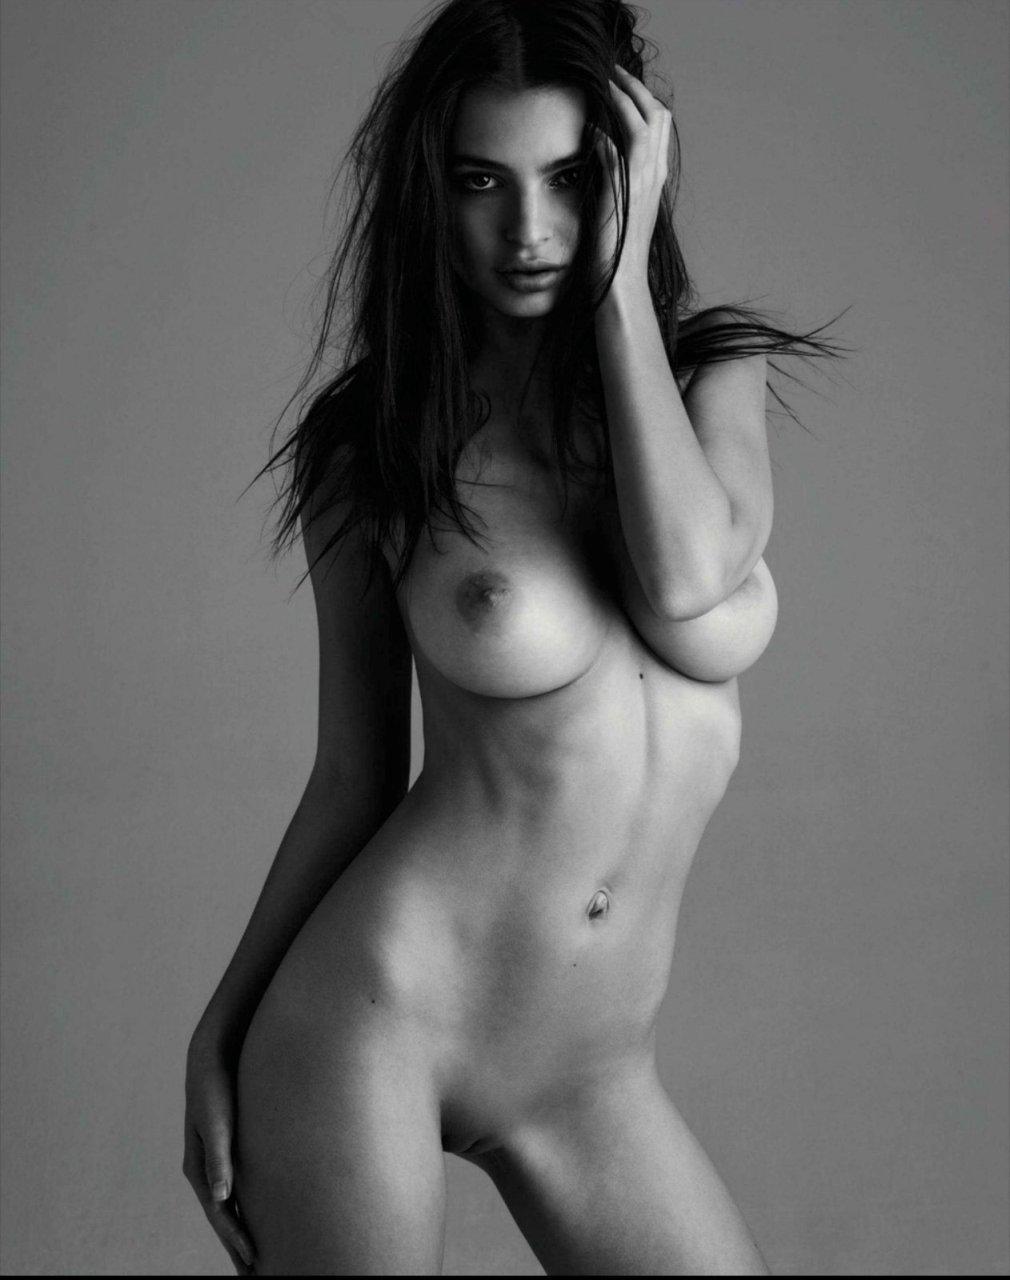 image Emily ratajkowski xoxo nude shoot